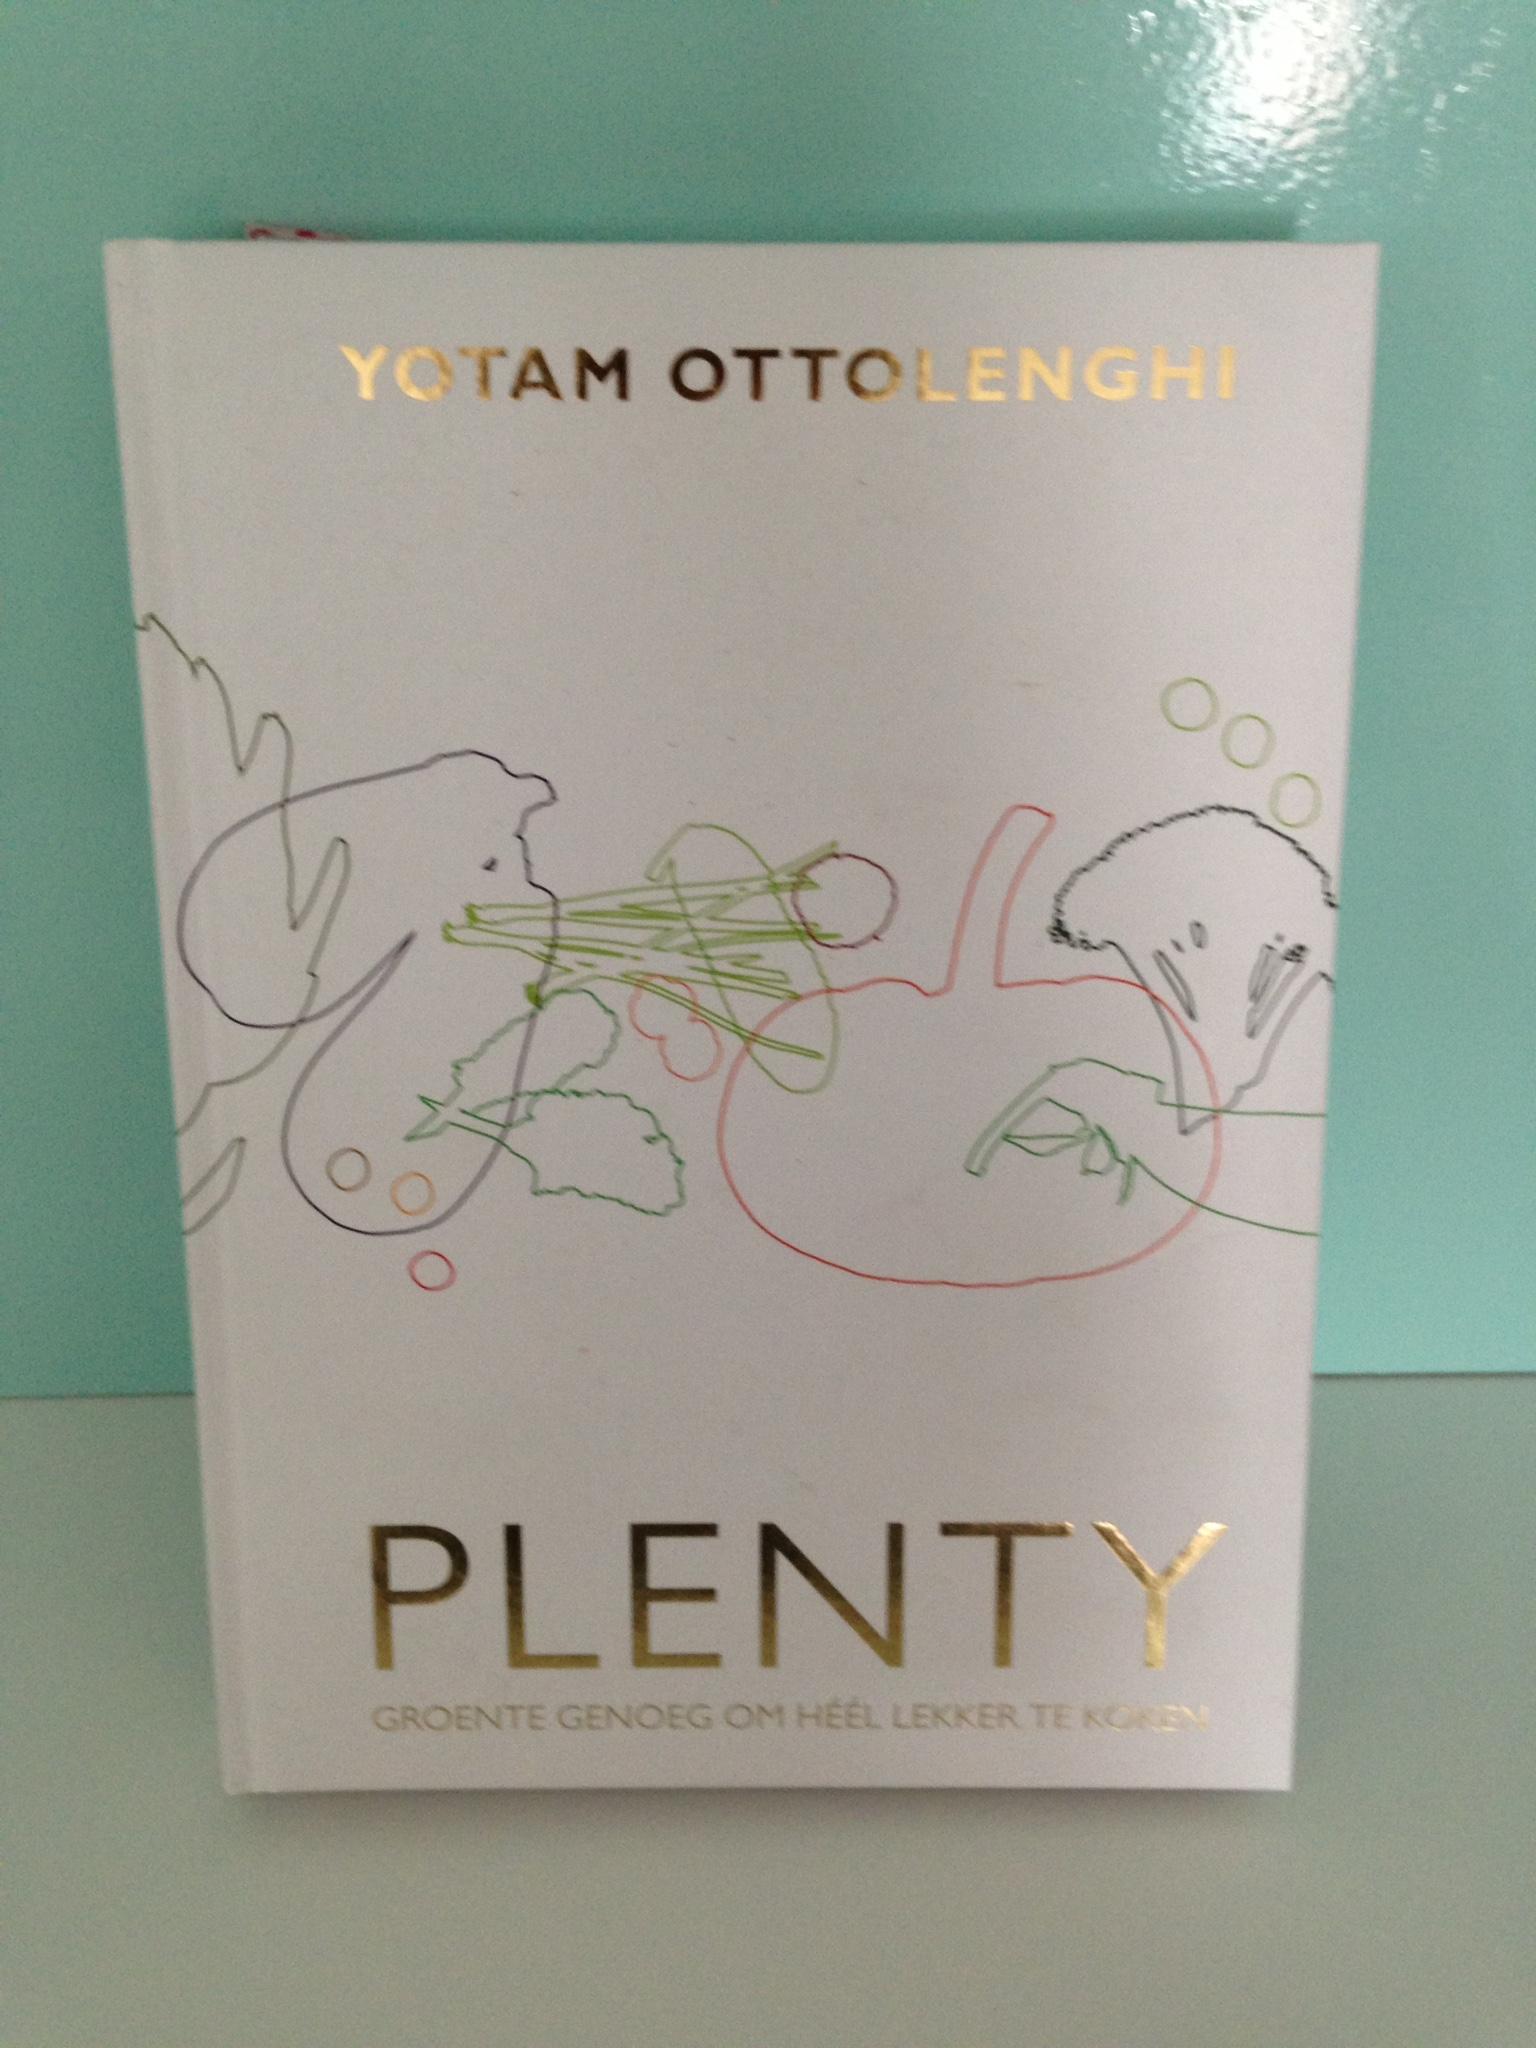 Plenty / Yotam Ottolenghi